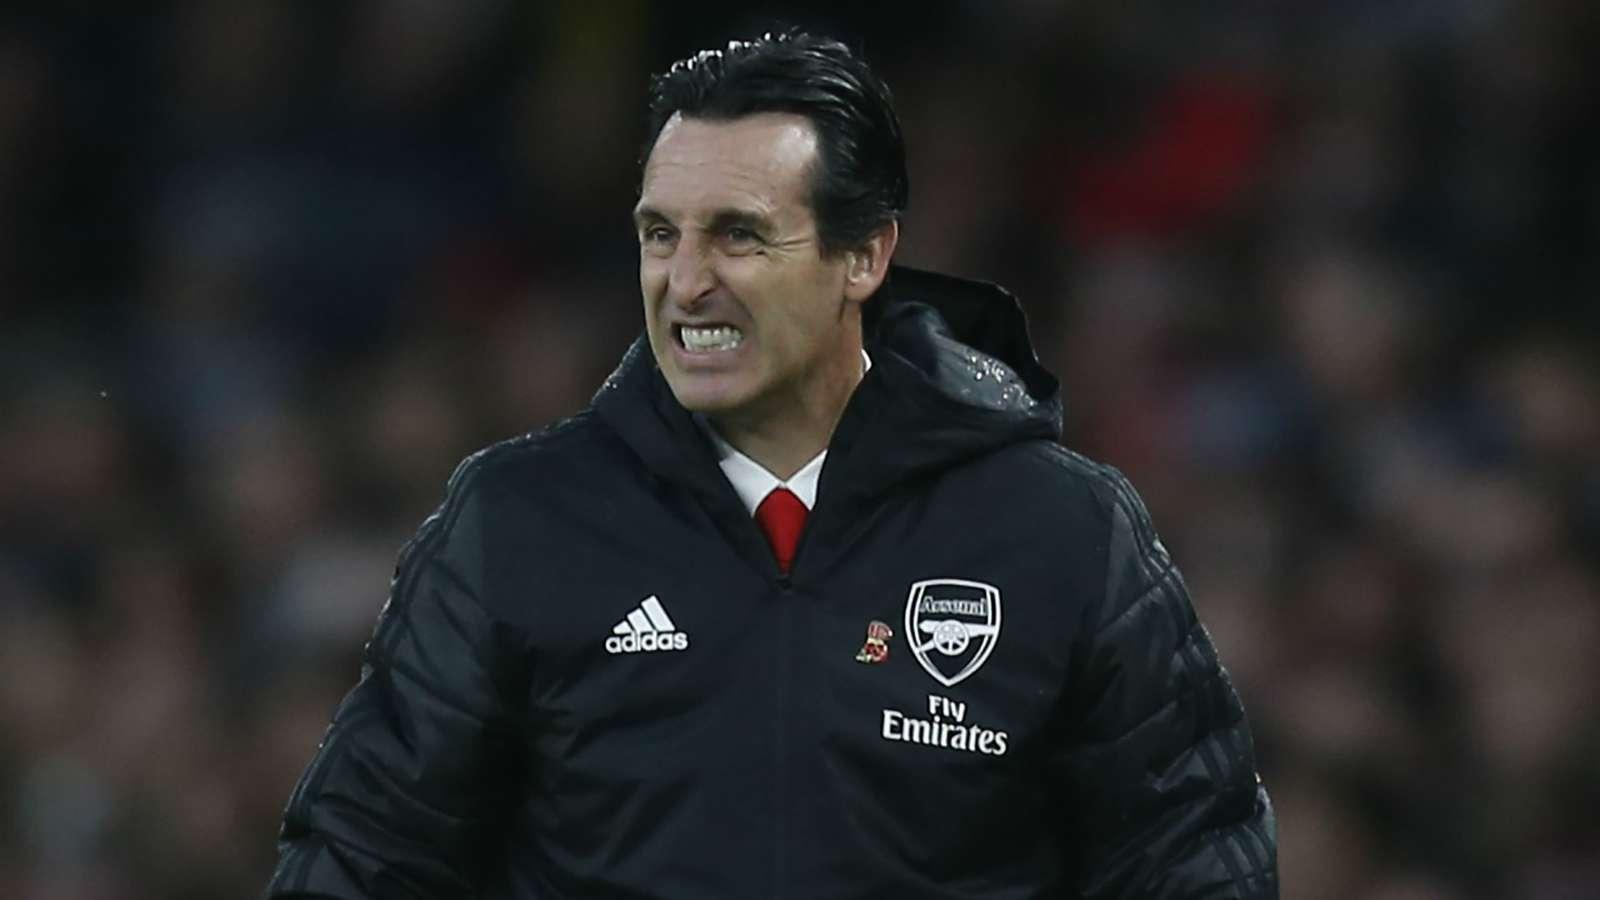 'It's not getting better!' - Arsenal need to sack Unai Emery, says club legend Ian Wright - Bóng Đá